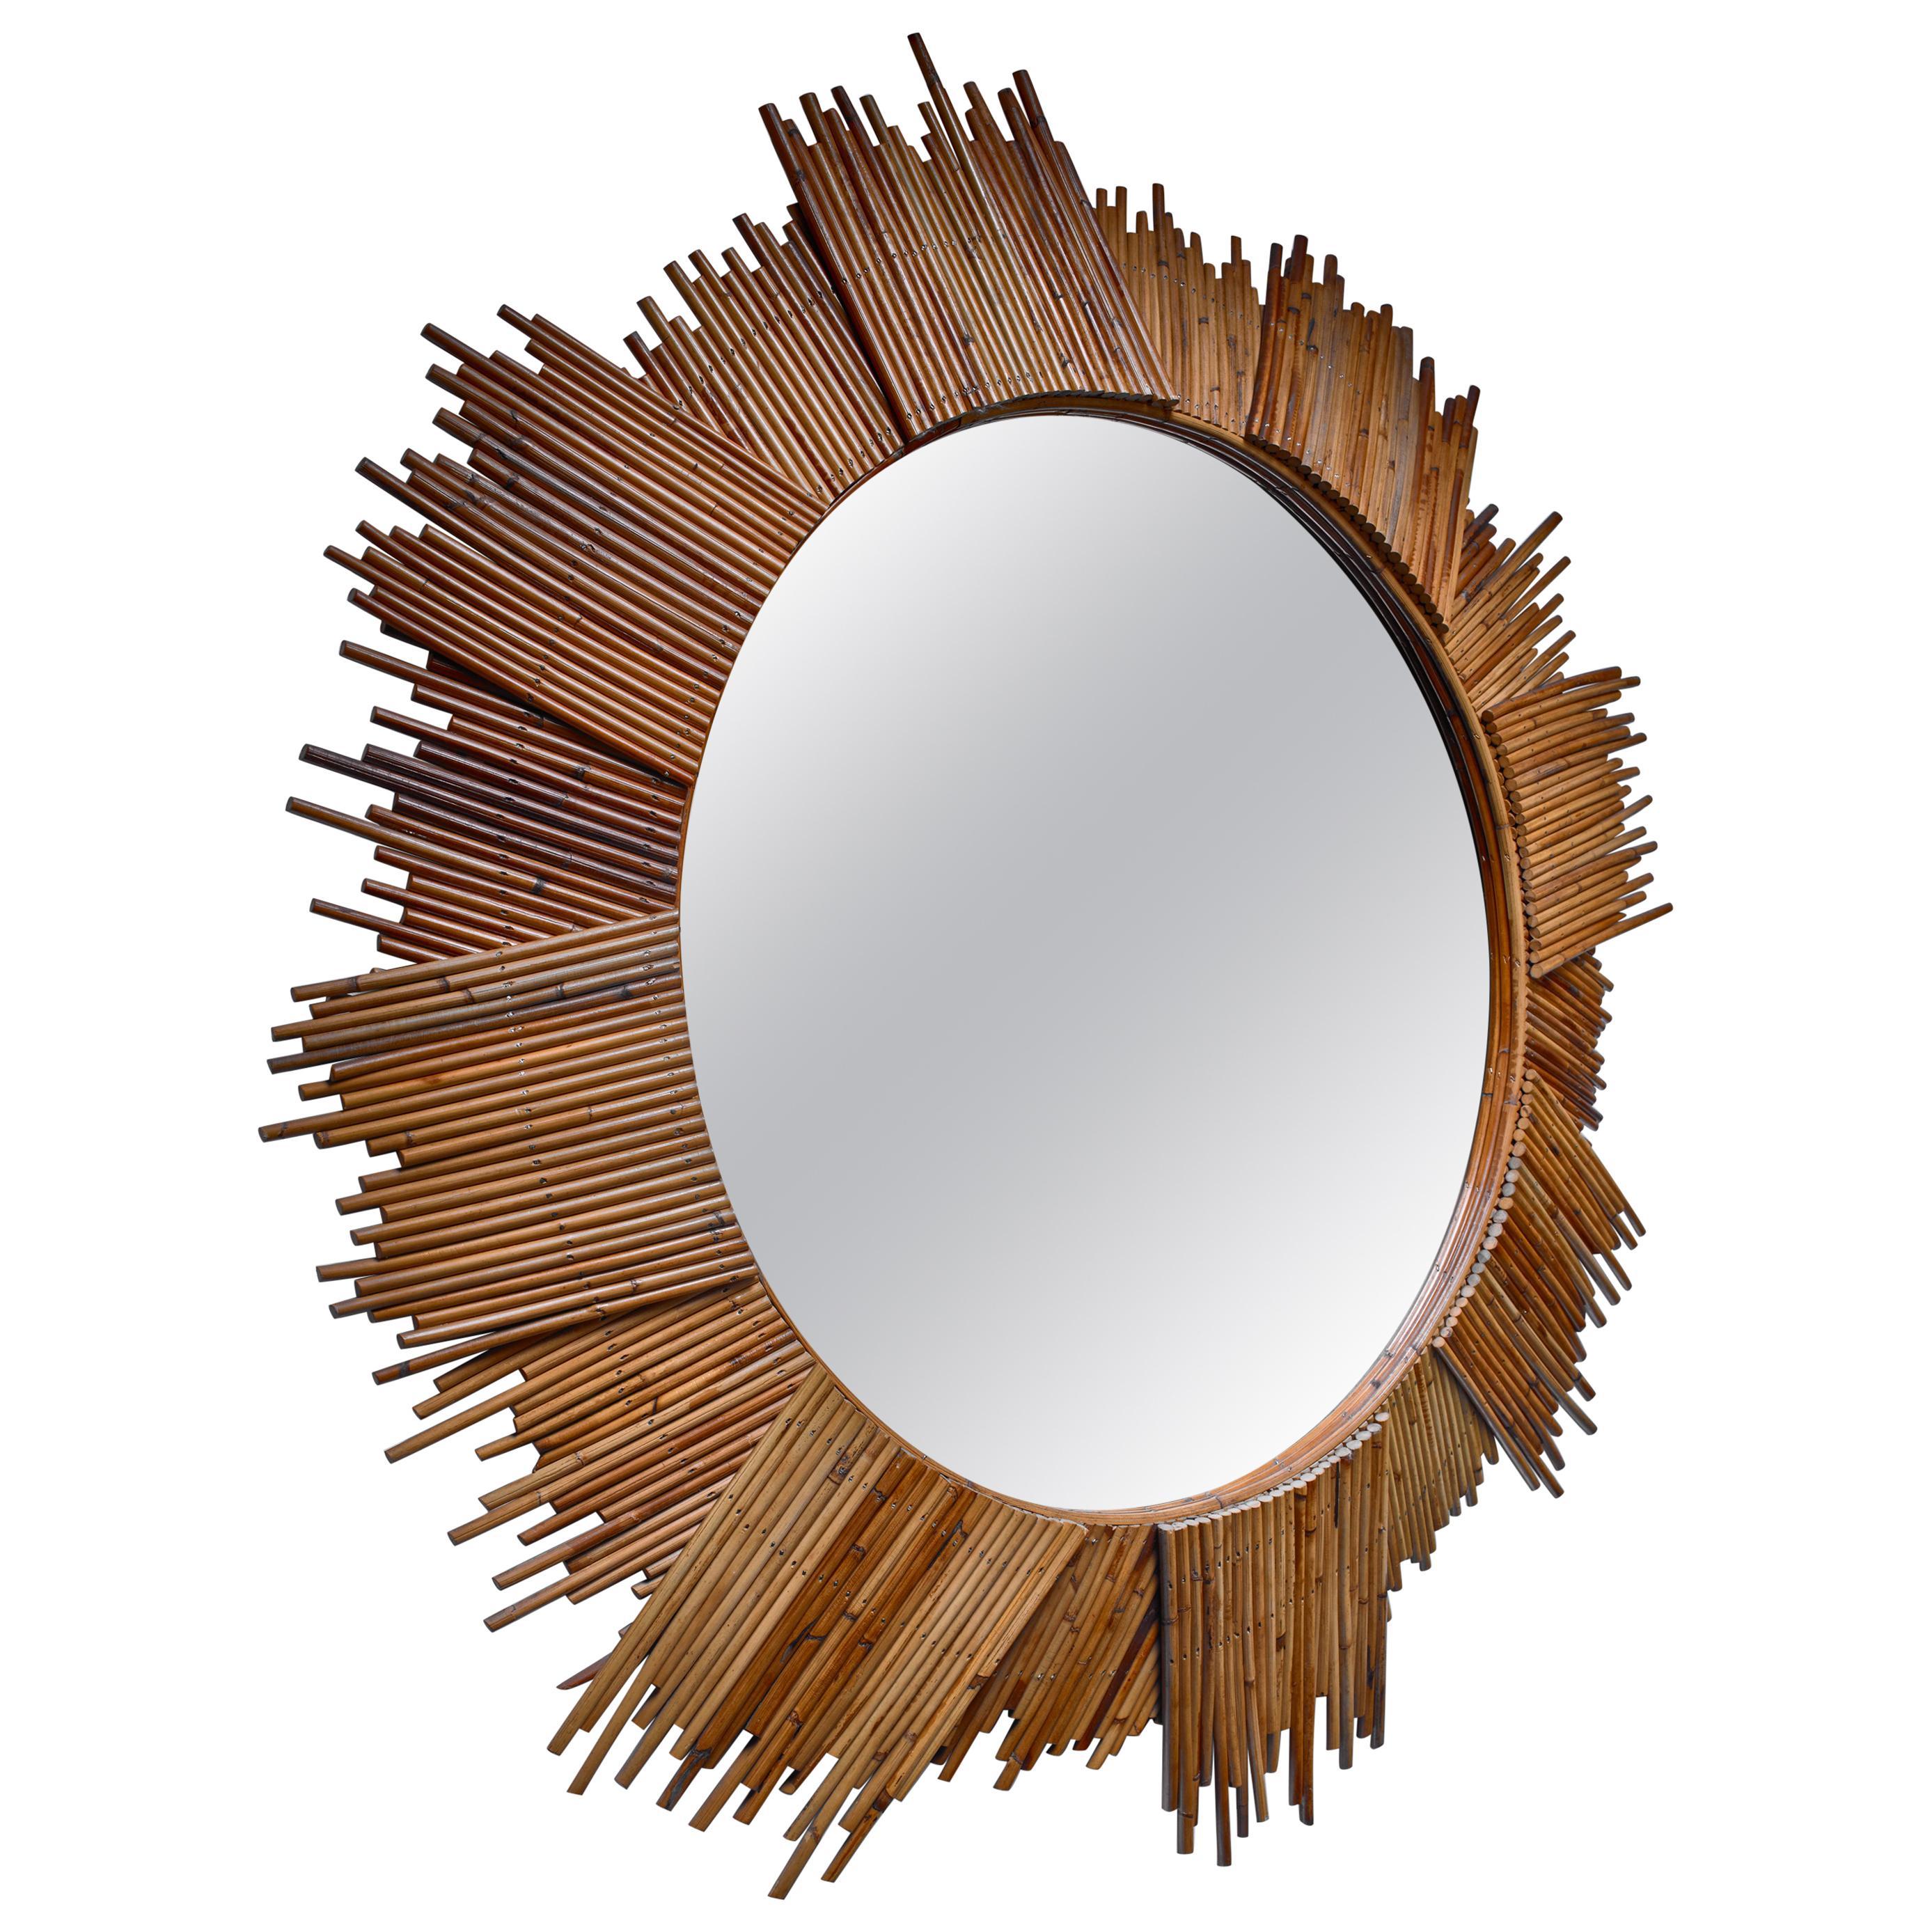 Large Bamboo Sunburst Wall Mirror